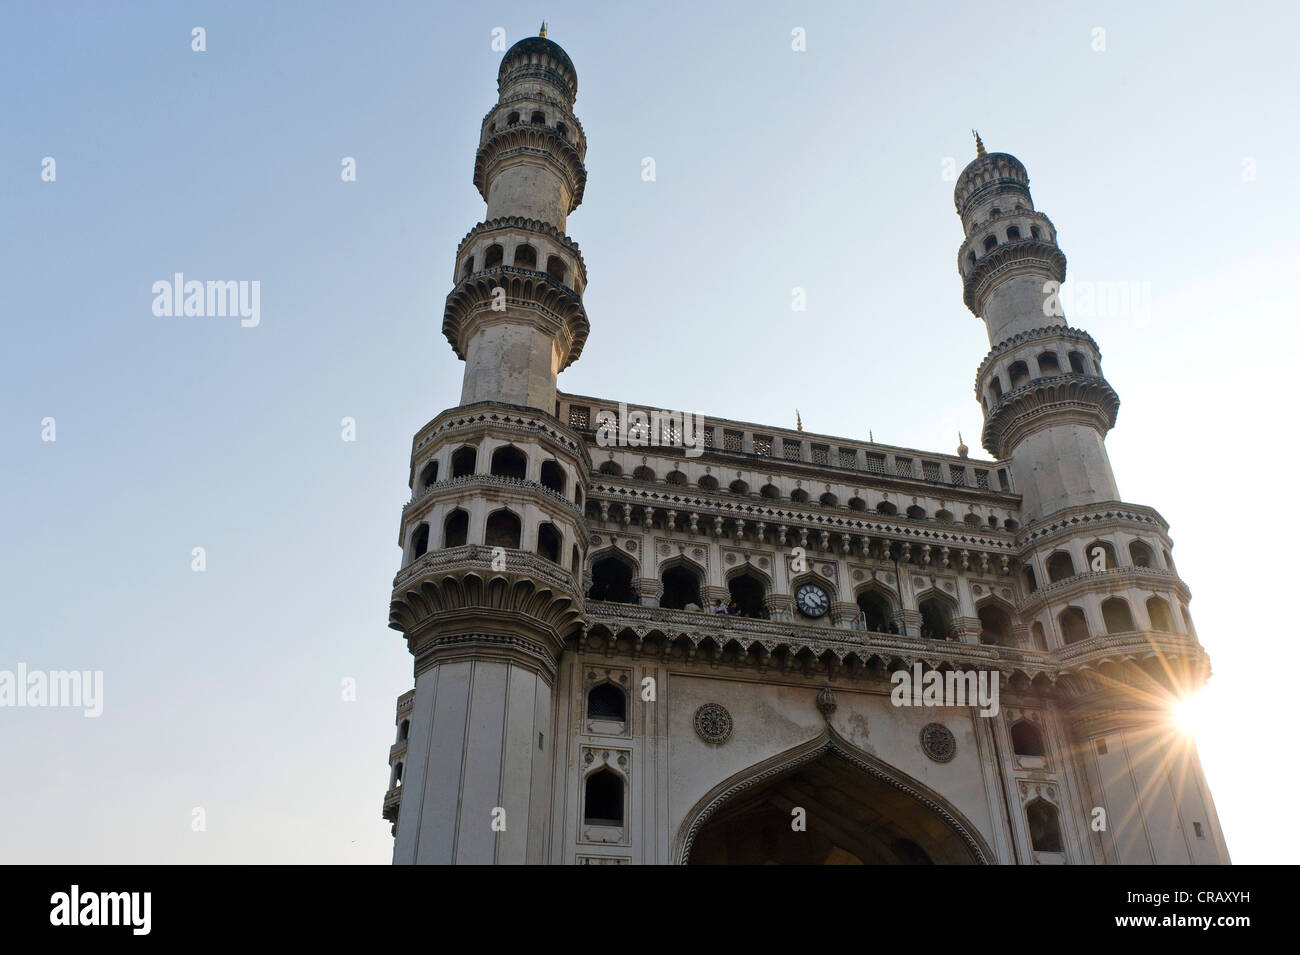 Monumento Charminar con quattro minareti, Hyderabad, Andhra Pradesh, India, Asia Immagini Stock